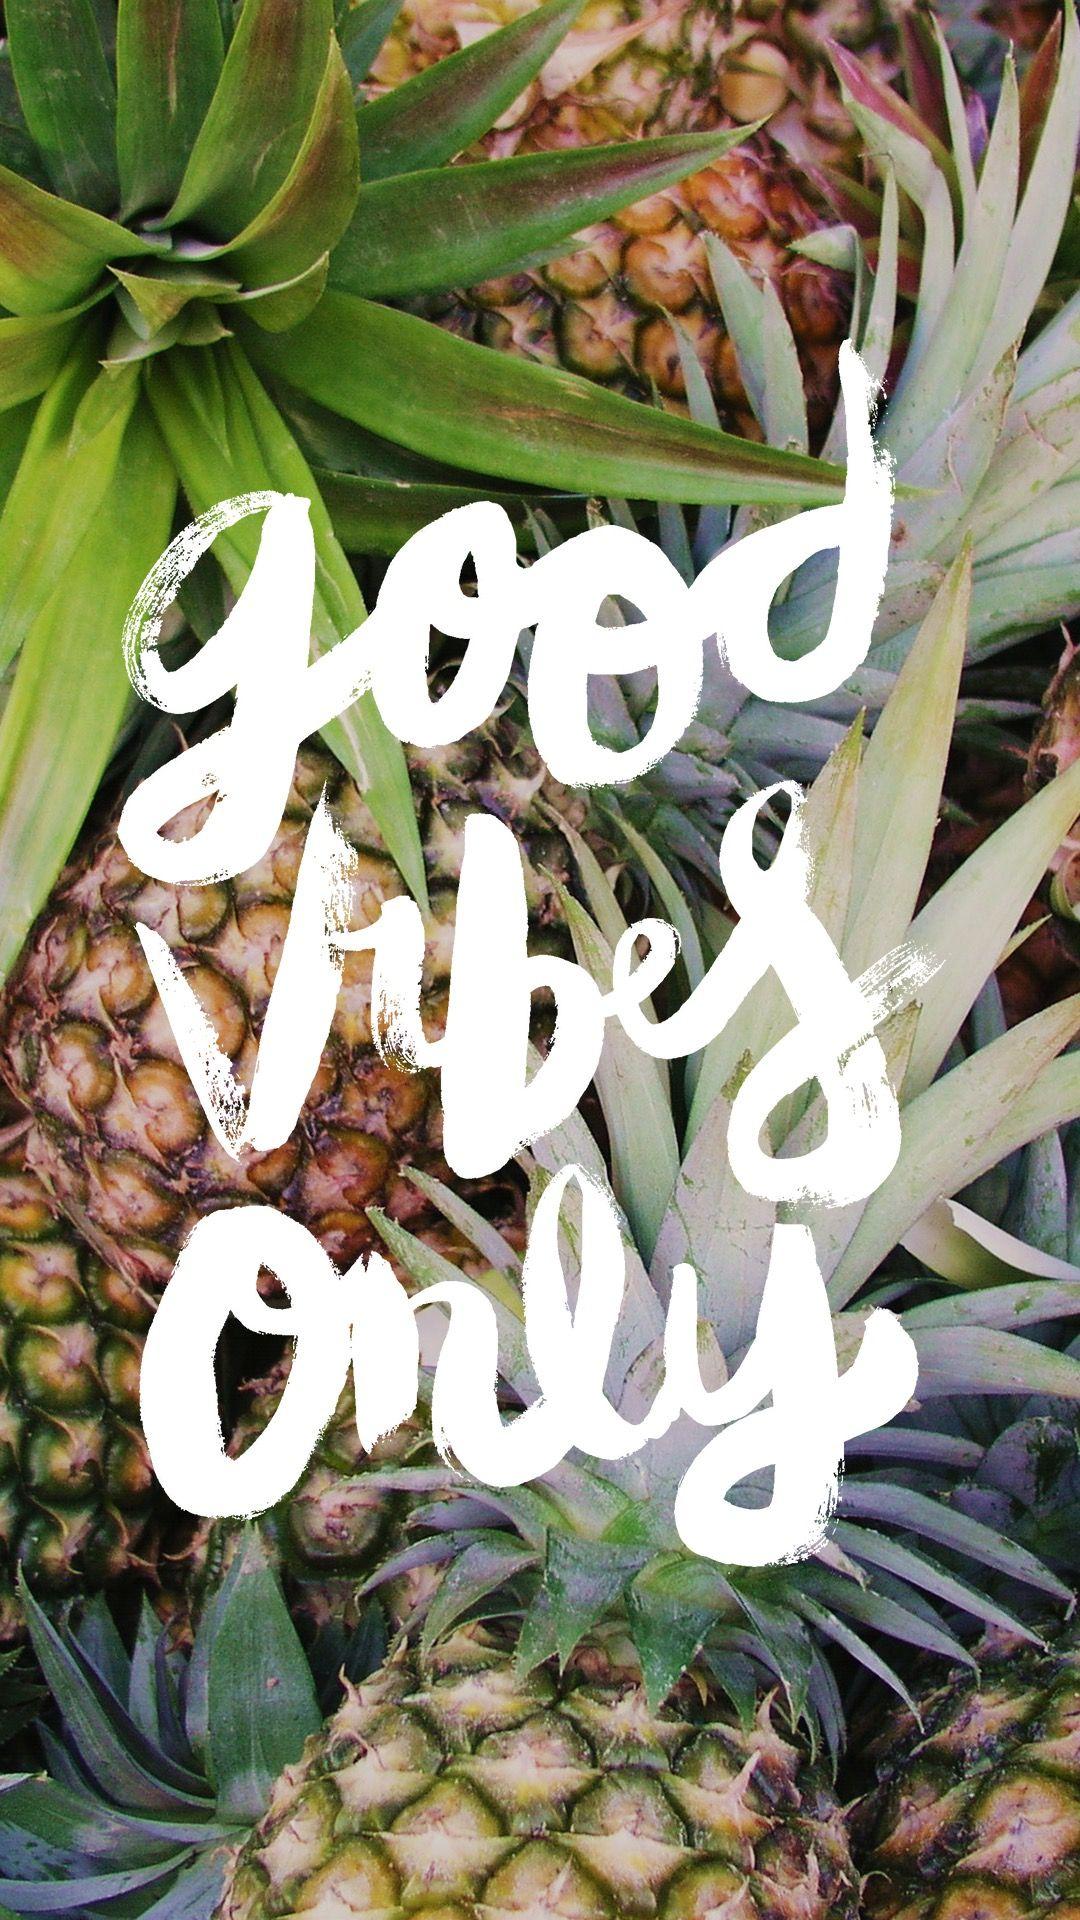 Good Wallpaper Home Screen Pineapple - 5e2a25a19dbc9f16d4fd572271e9ac83  Trends_549399.jpg